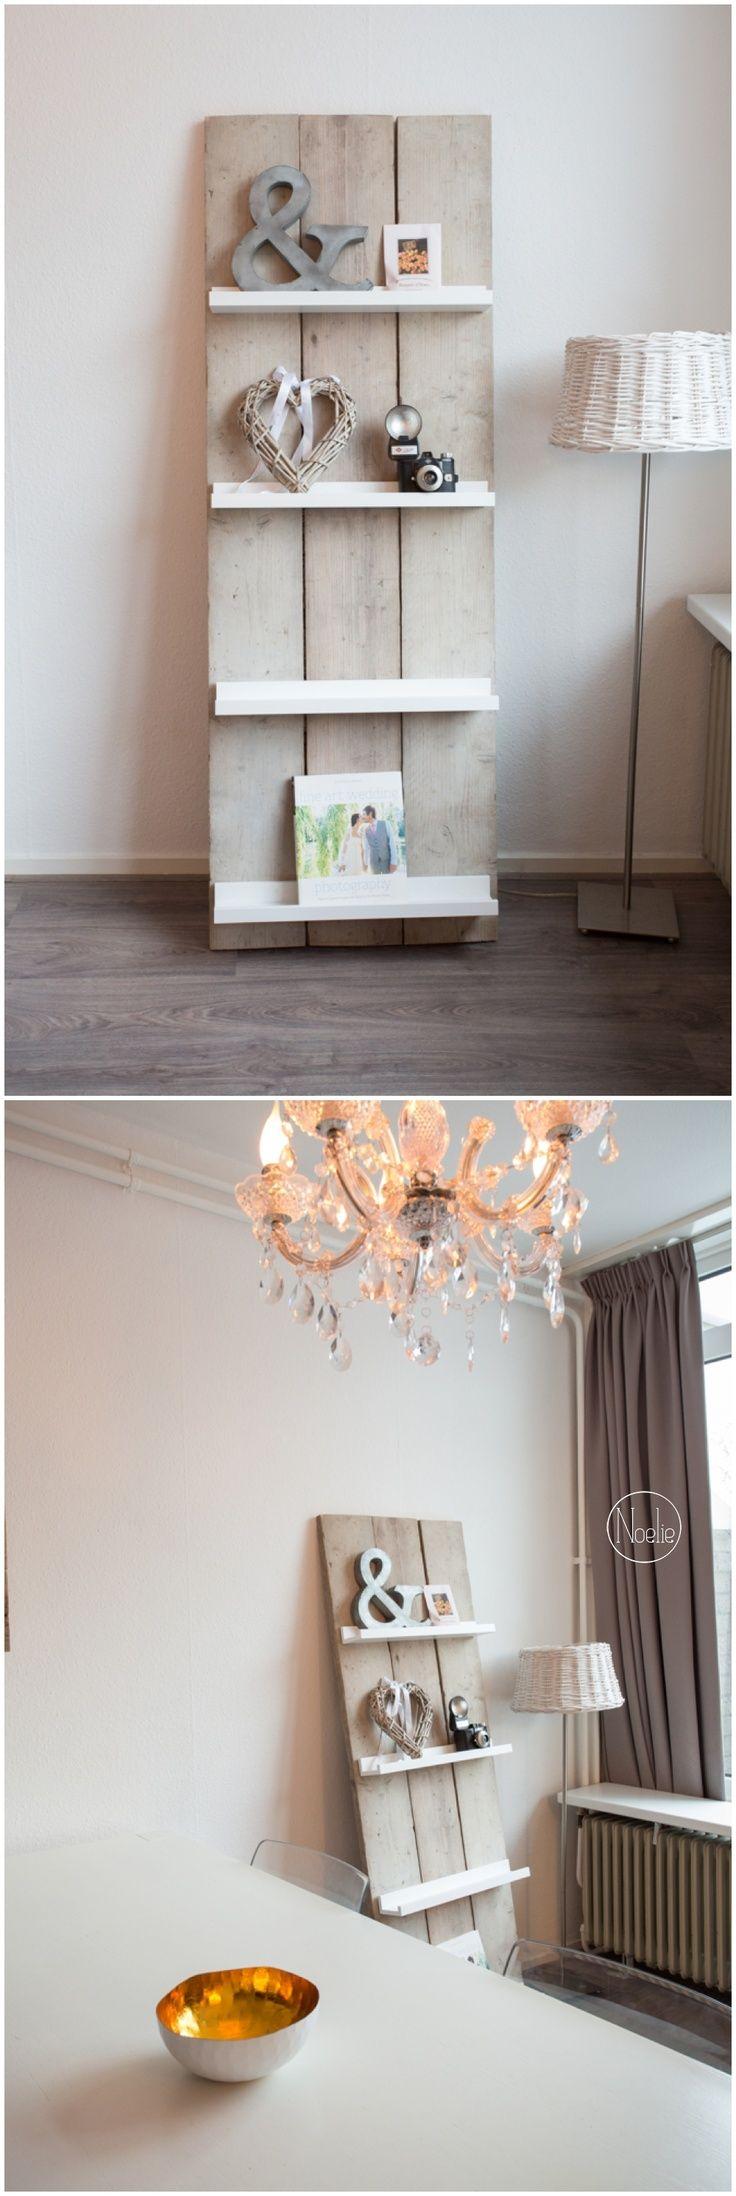 Tijdschriftenrek van steigerhout | for the home | Pinterest ...